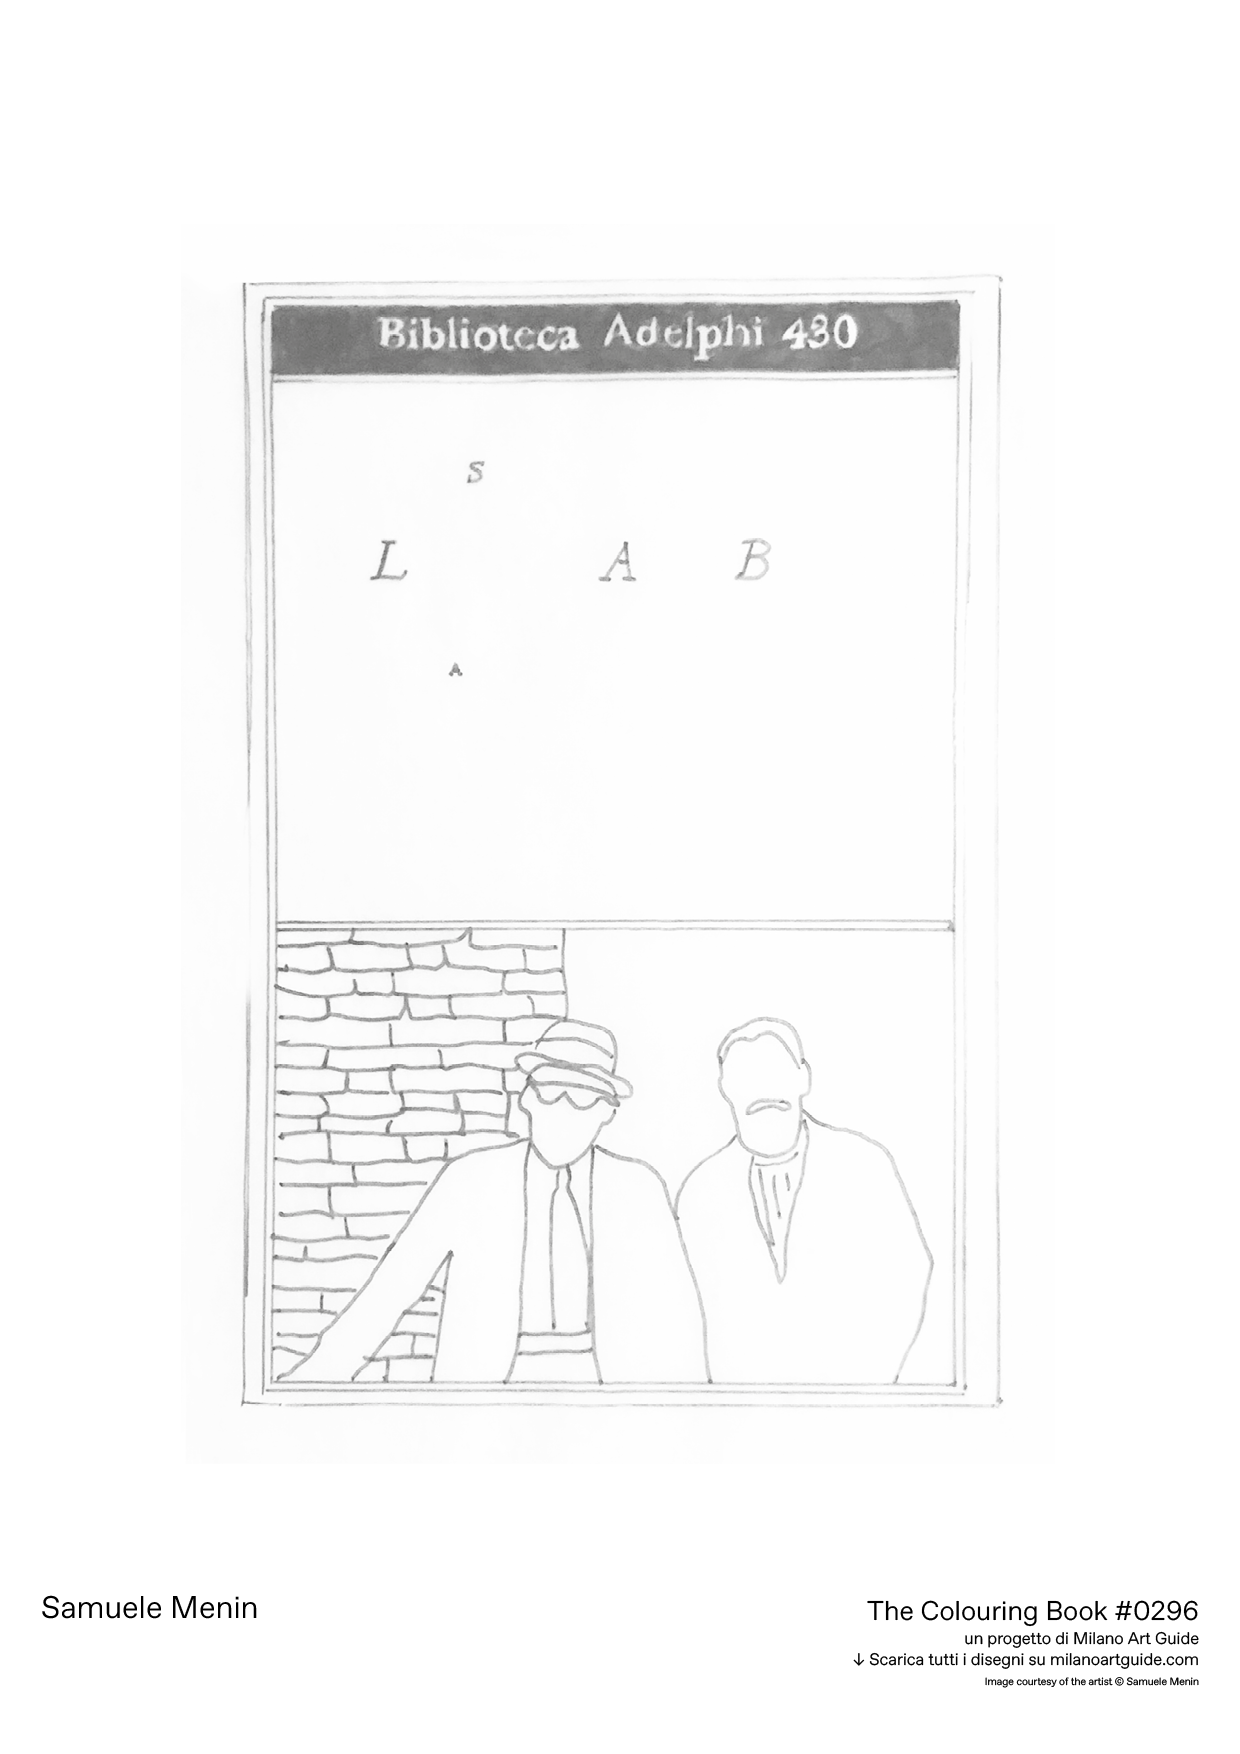 296_SamueleMenin_THECOLOURINGBOOK_MILANOARTGUIDE.png